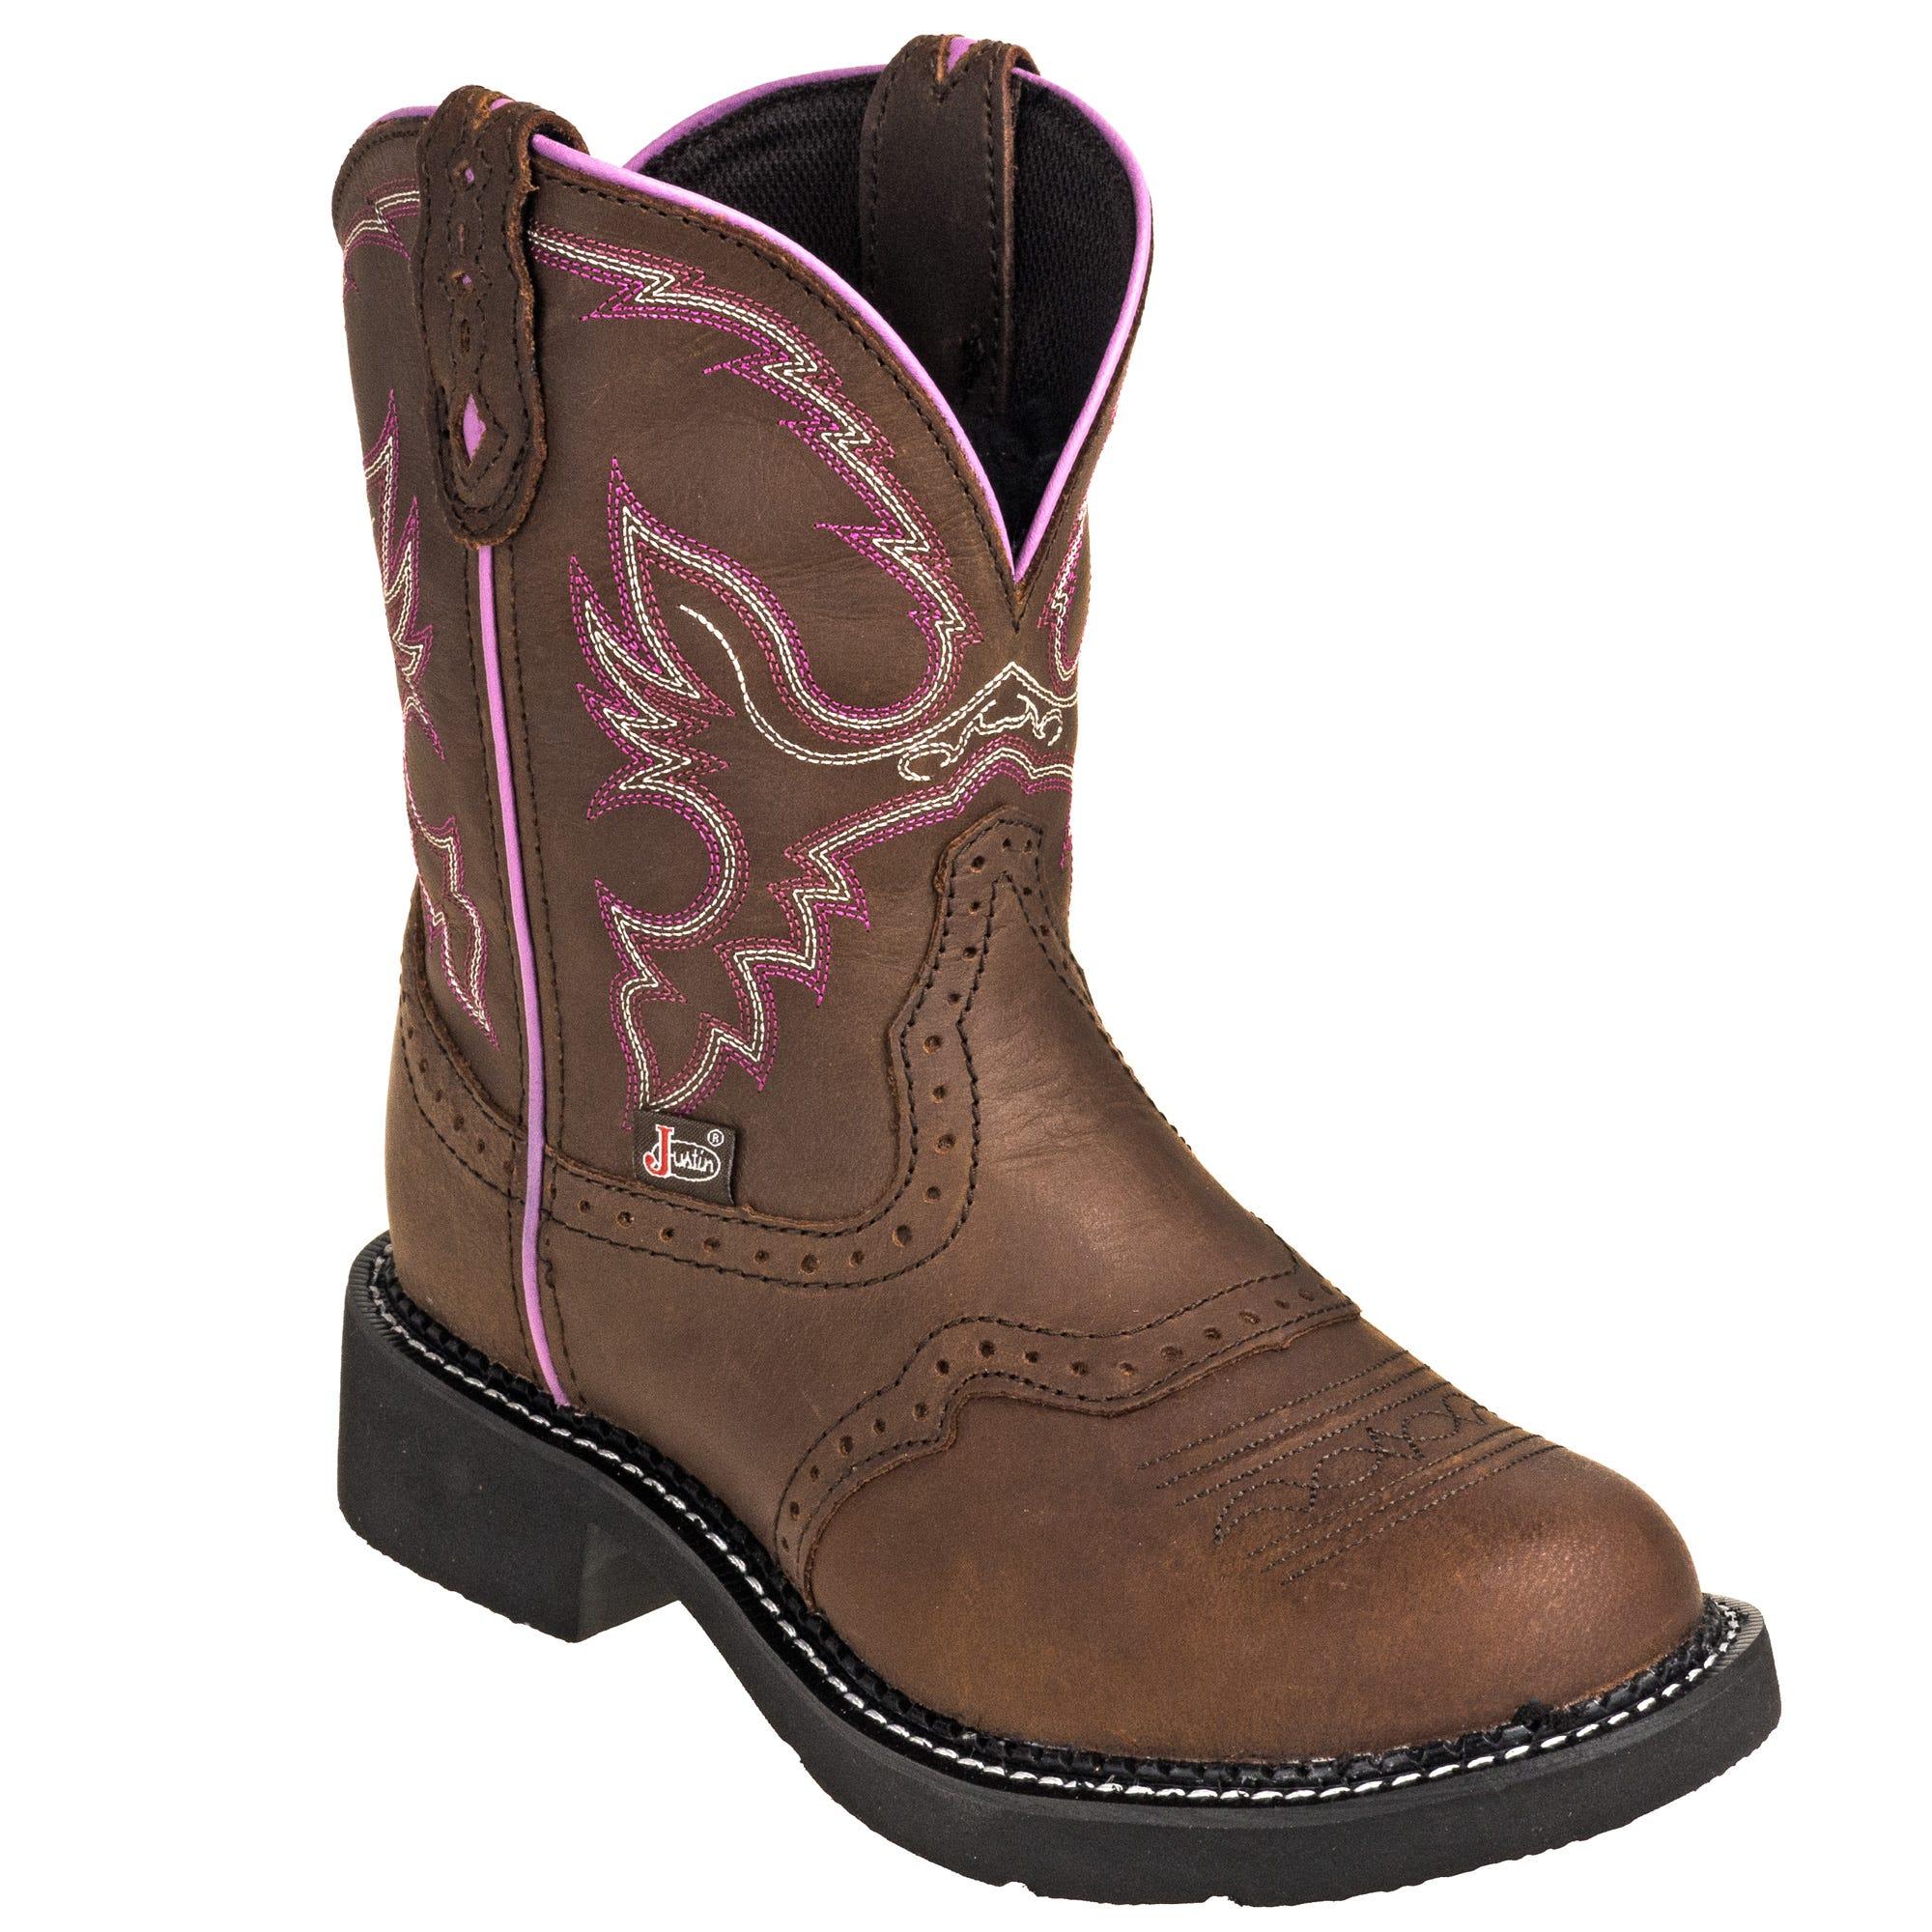 Justin Women's L9903 Brown 8-Inch General Toe Gemma Cowboy Boots